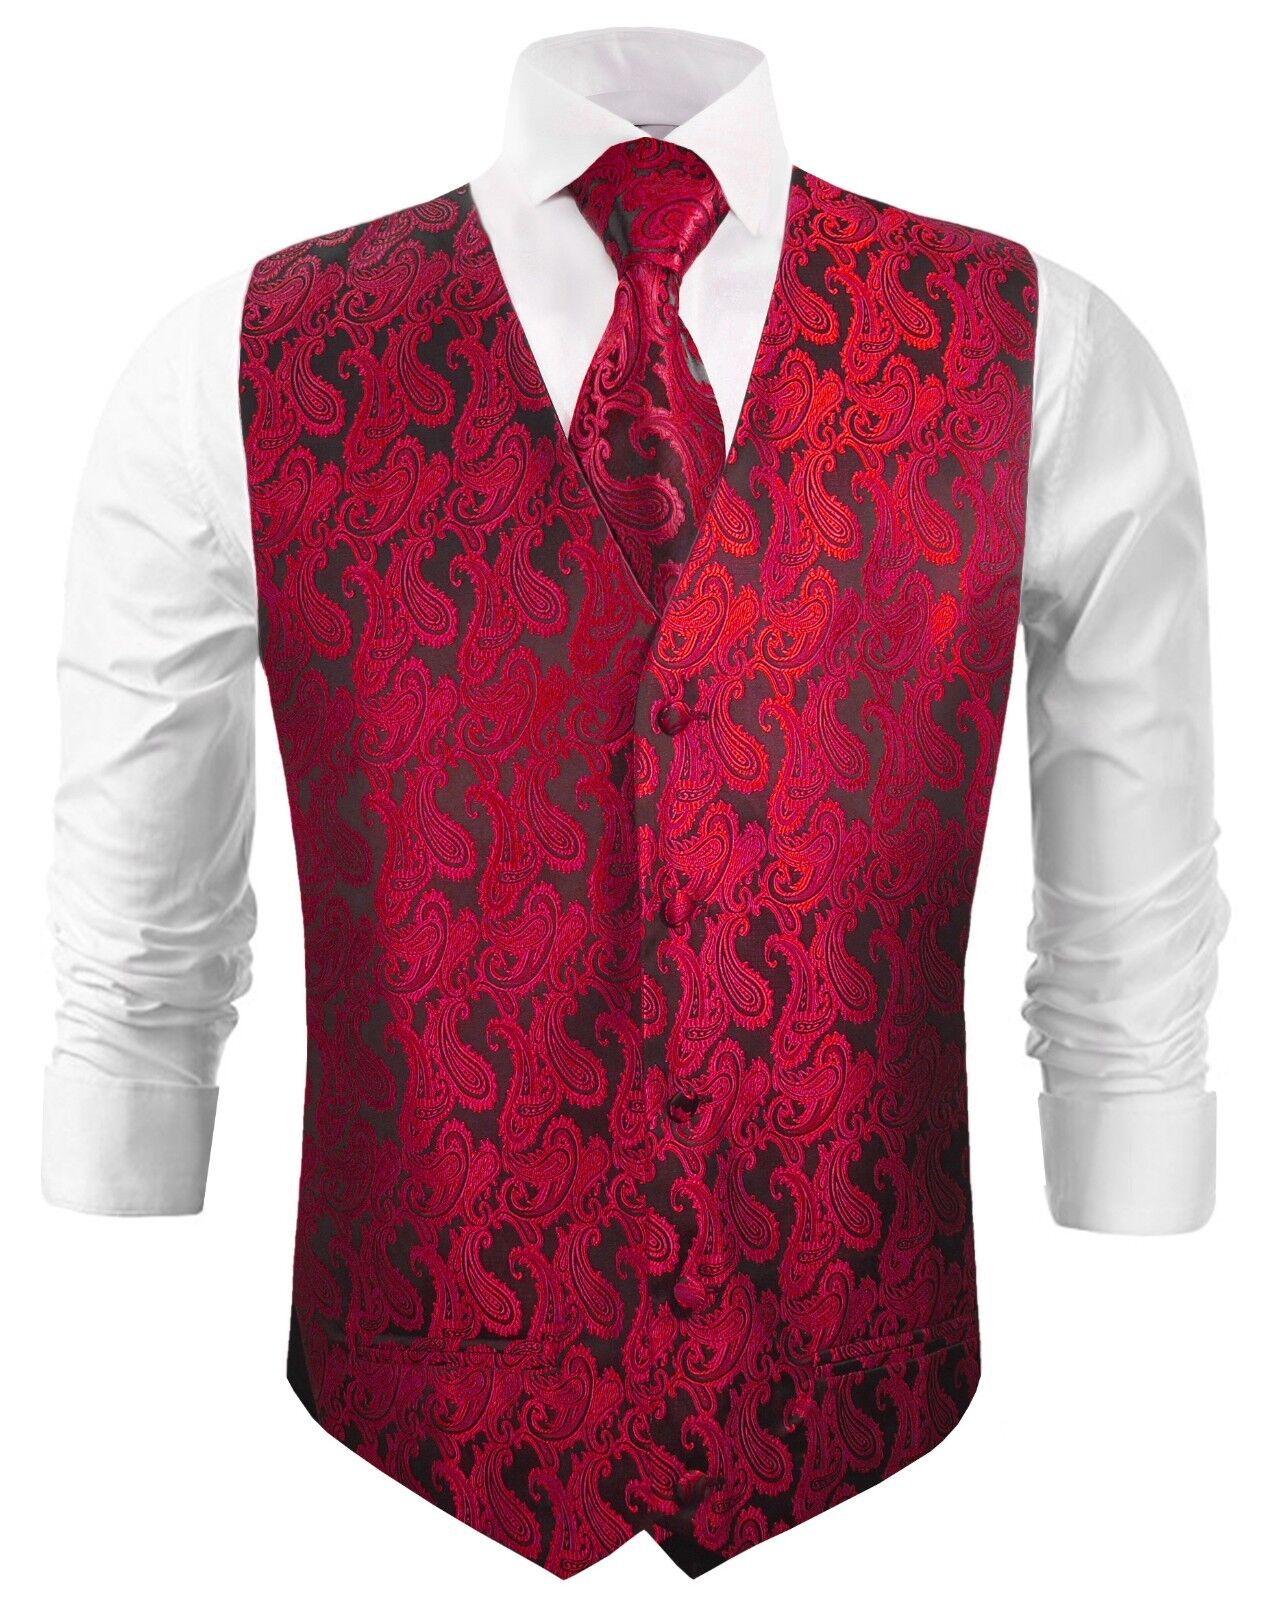 Paul Malone Hochzeitsweste mit Krawatte schwarz rot paisley v99